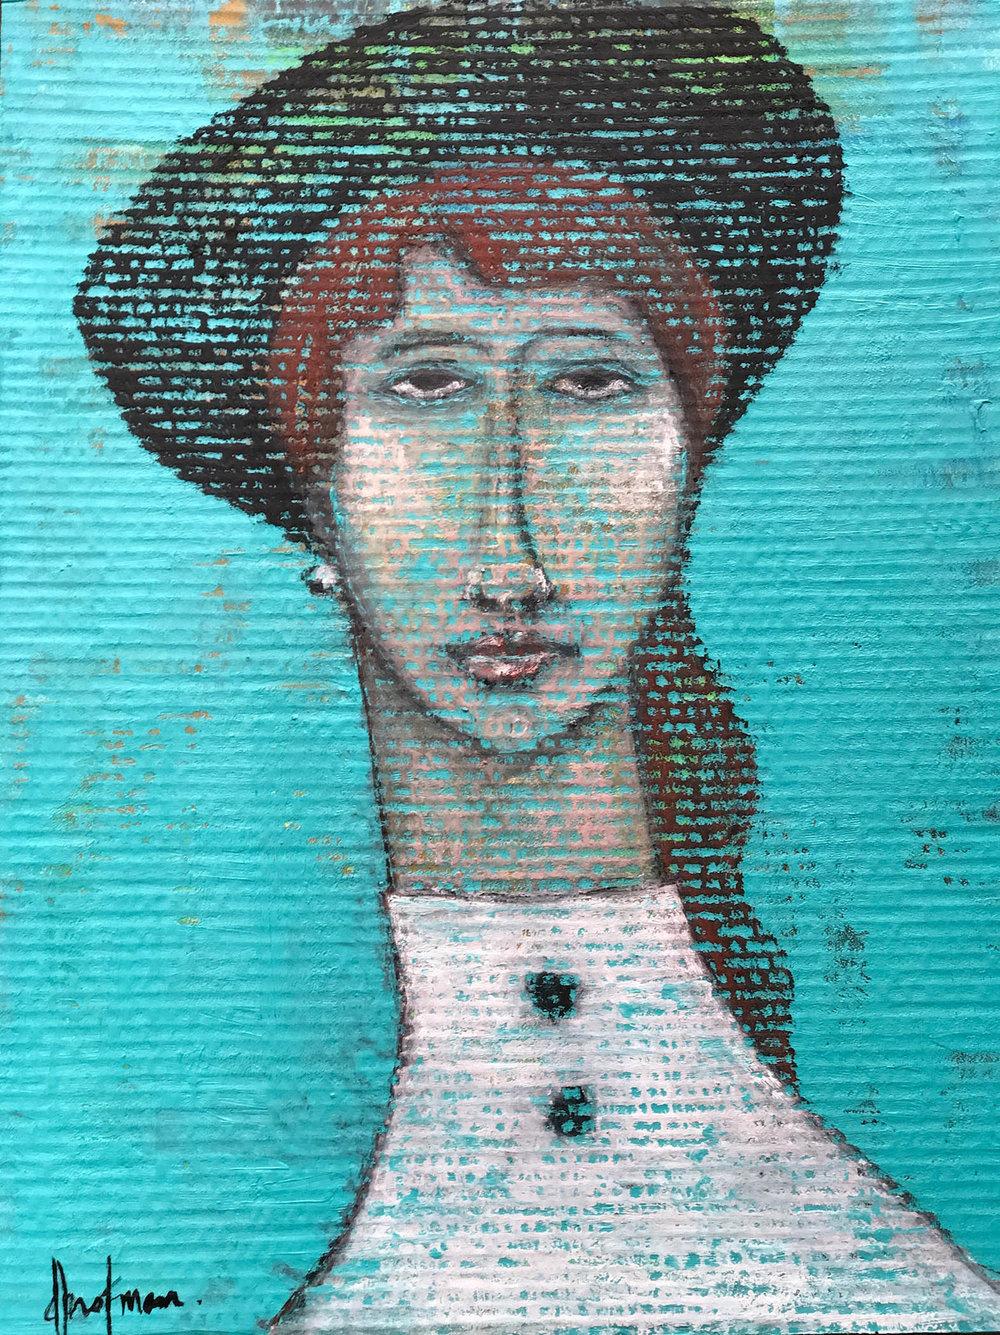 brotman-dana-woman-with-hat-pr.jpg